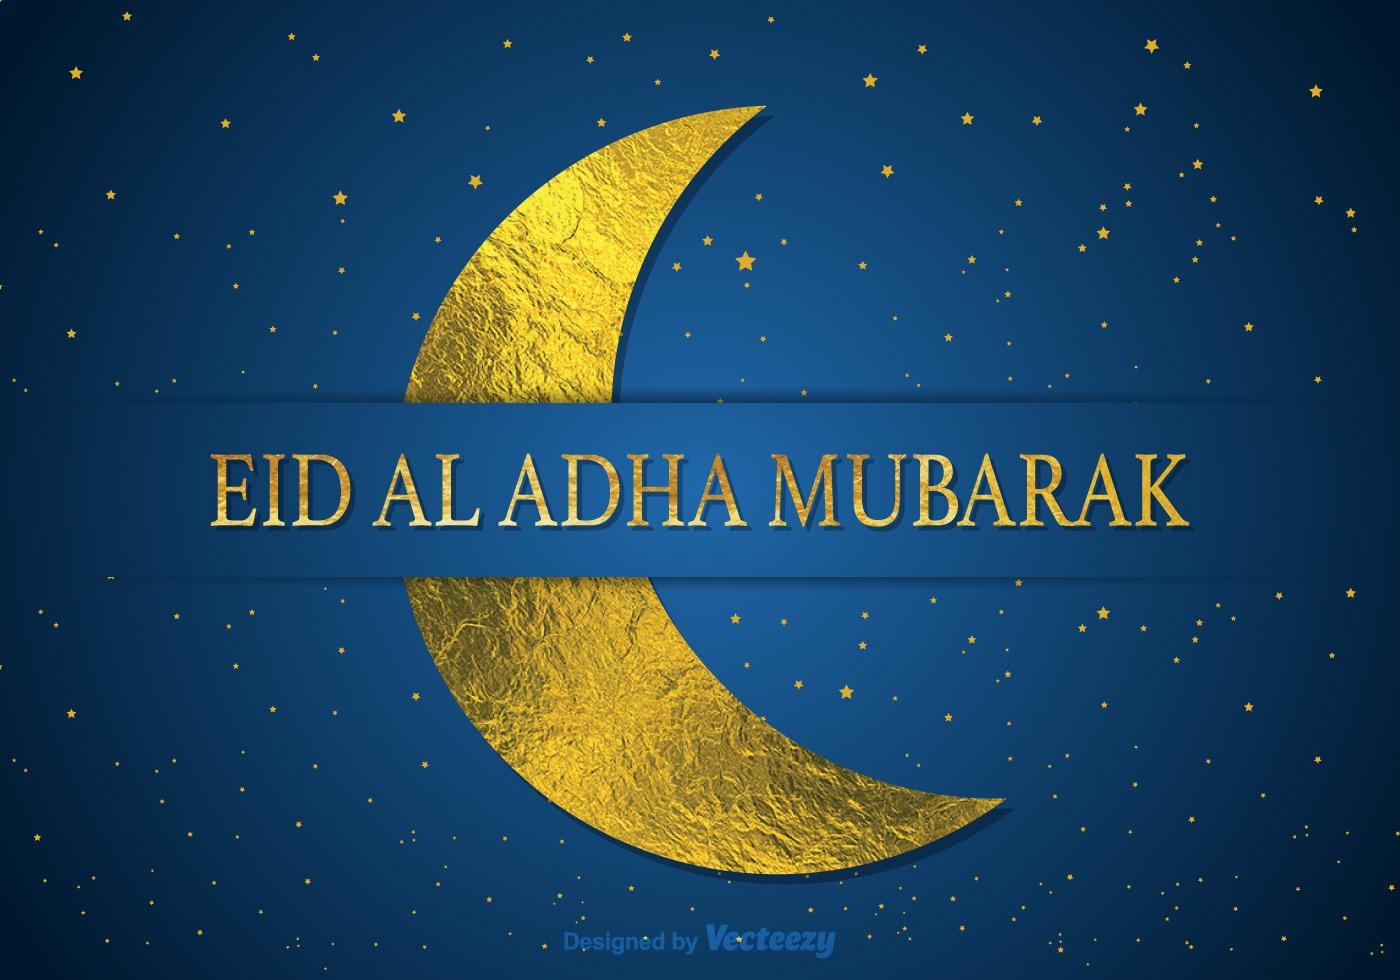 Eid Al Adha Mubarak Vector Card Download Free Vector Art Stock